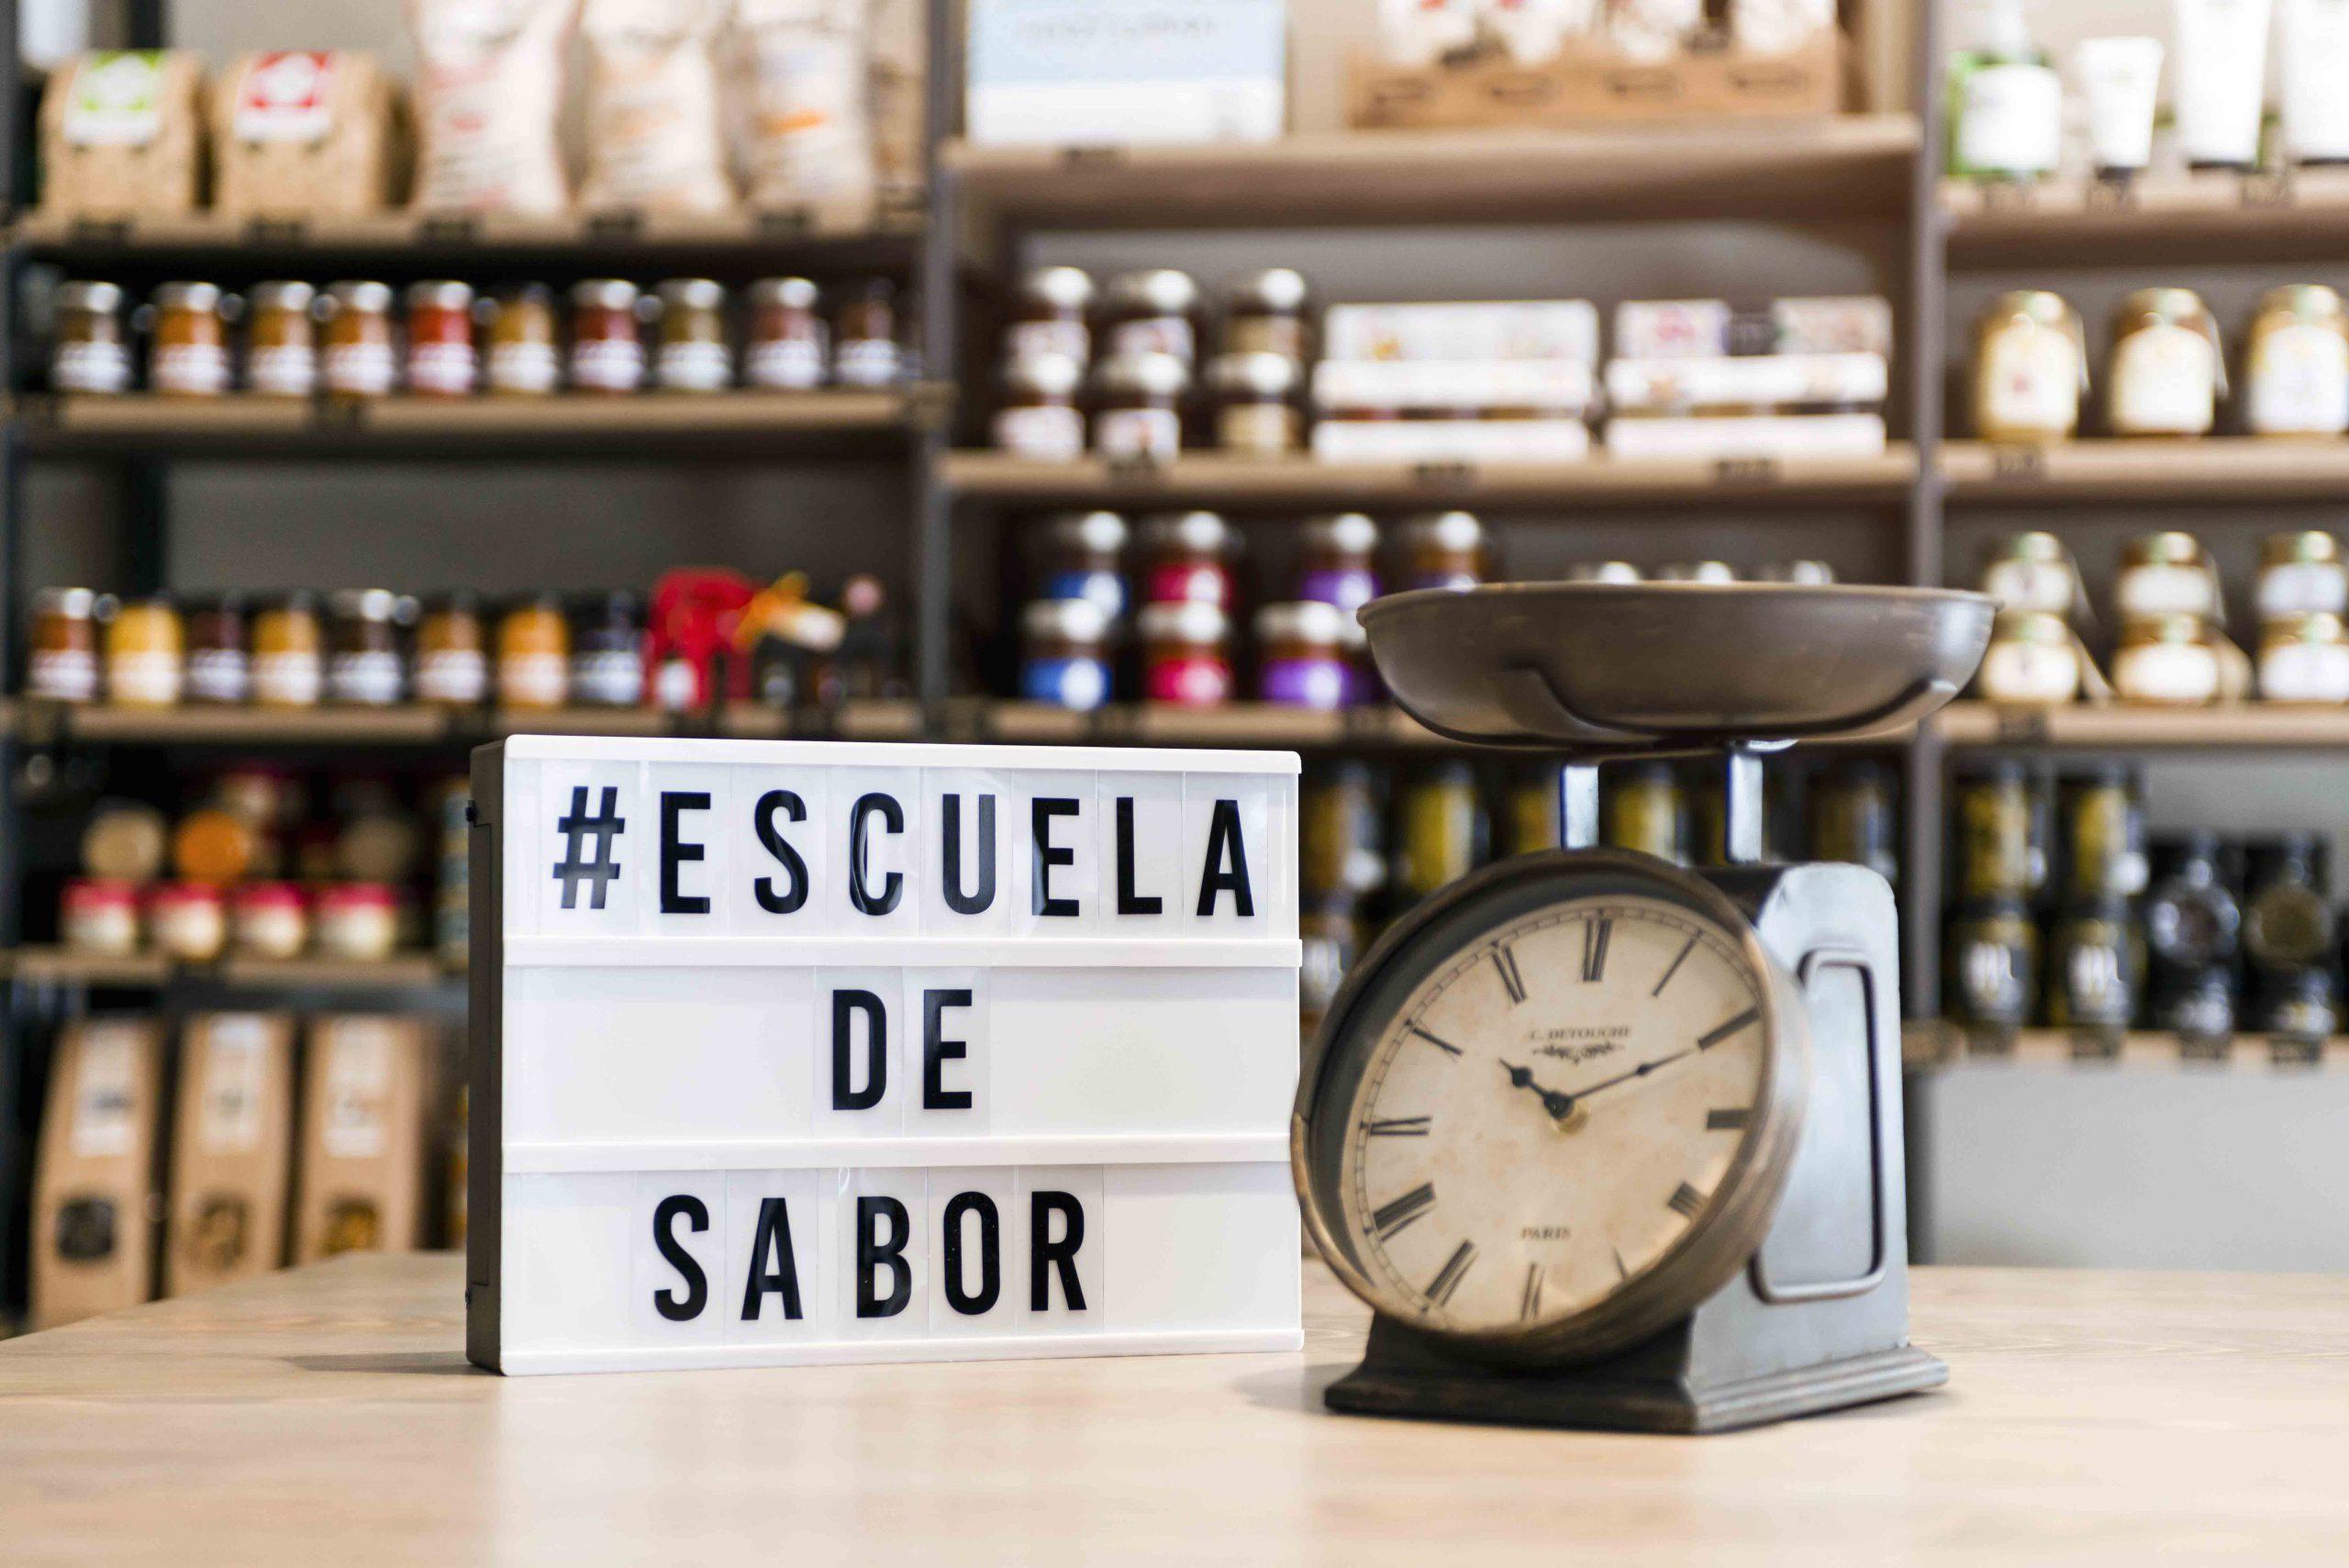 http://gustavolahera.com/wp-content/uploads/2020/11/Foto-13-Escuela-de-Sabor-scaled.jpg